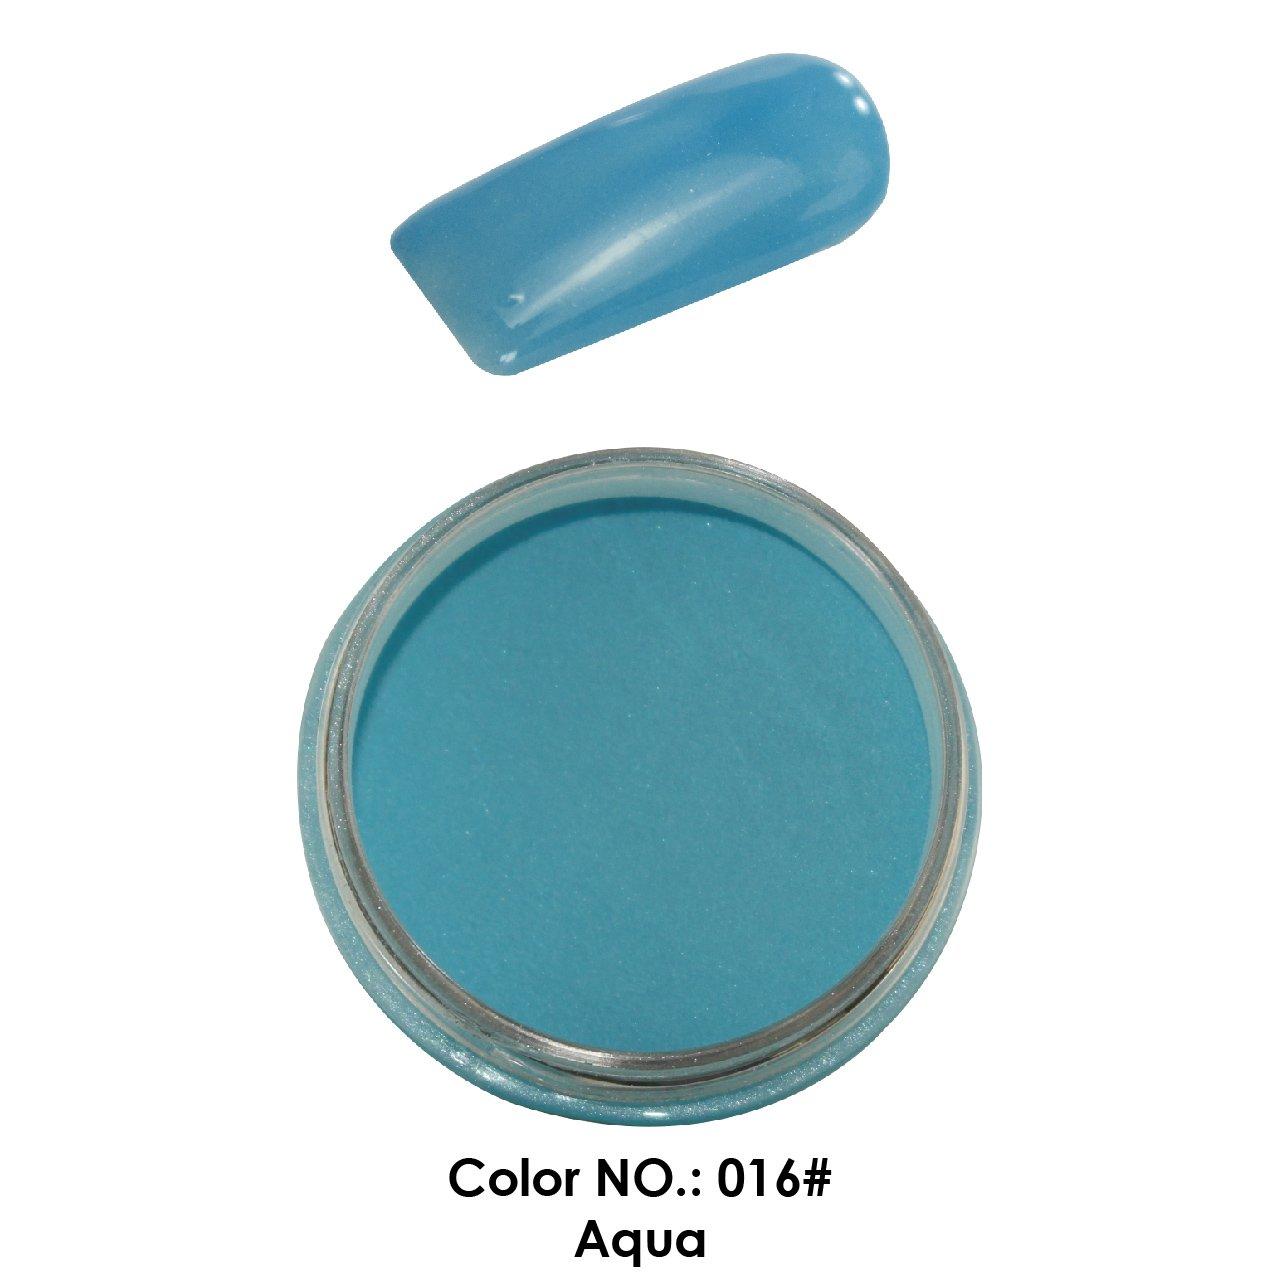 C & I Dipping Powder Color No.016 Aqua Blue Color System Fulei Trading